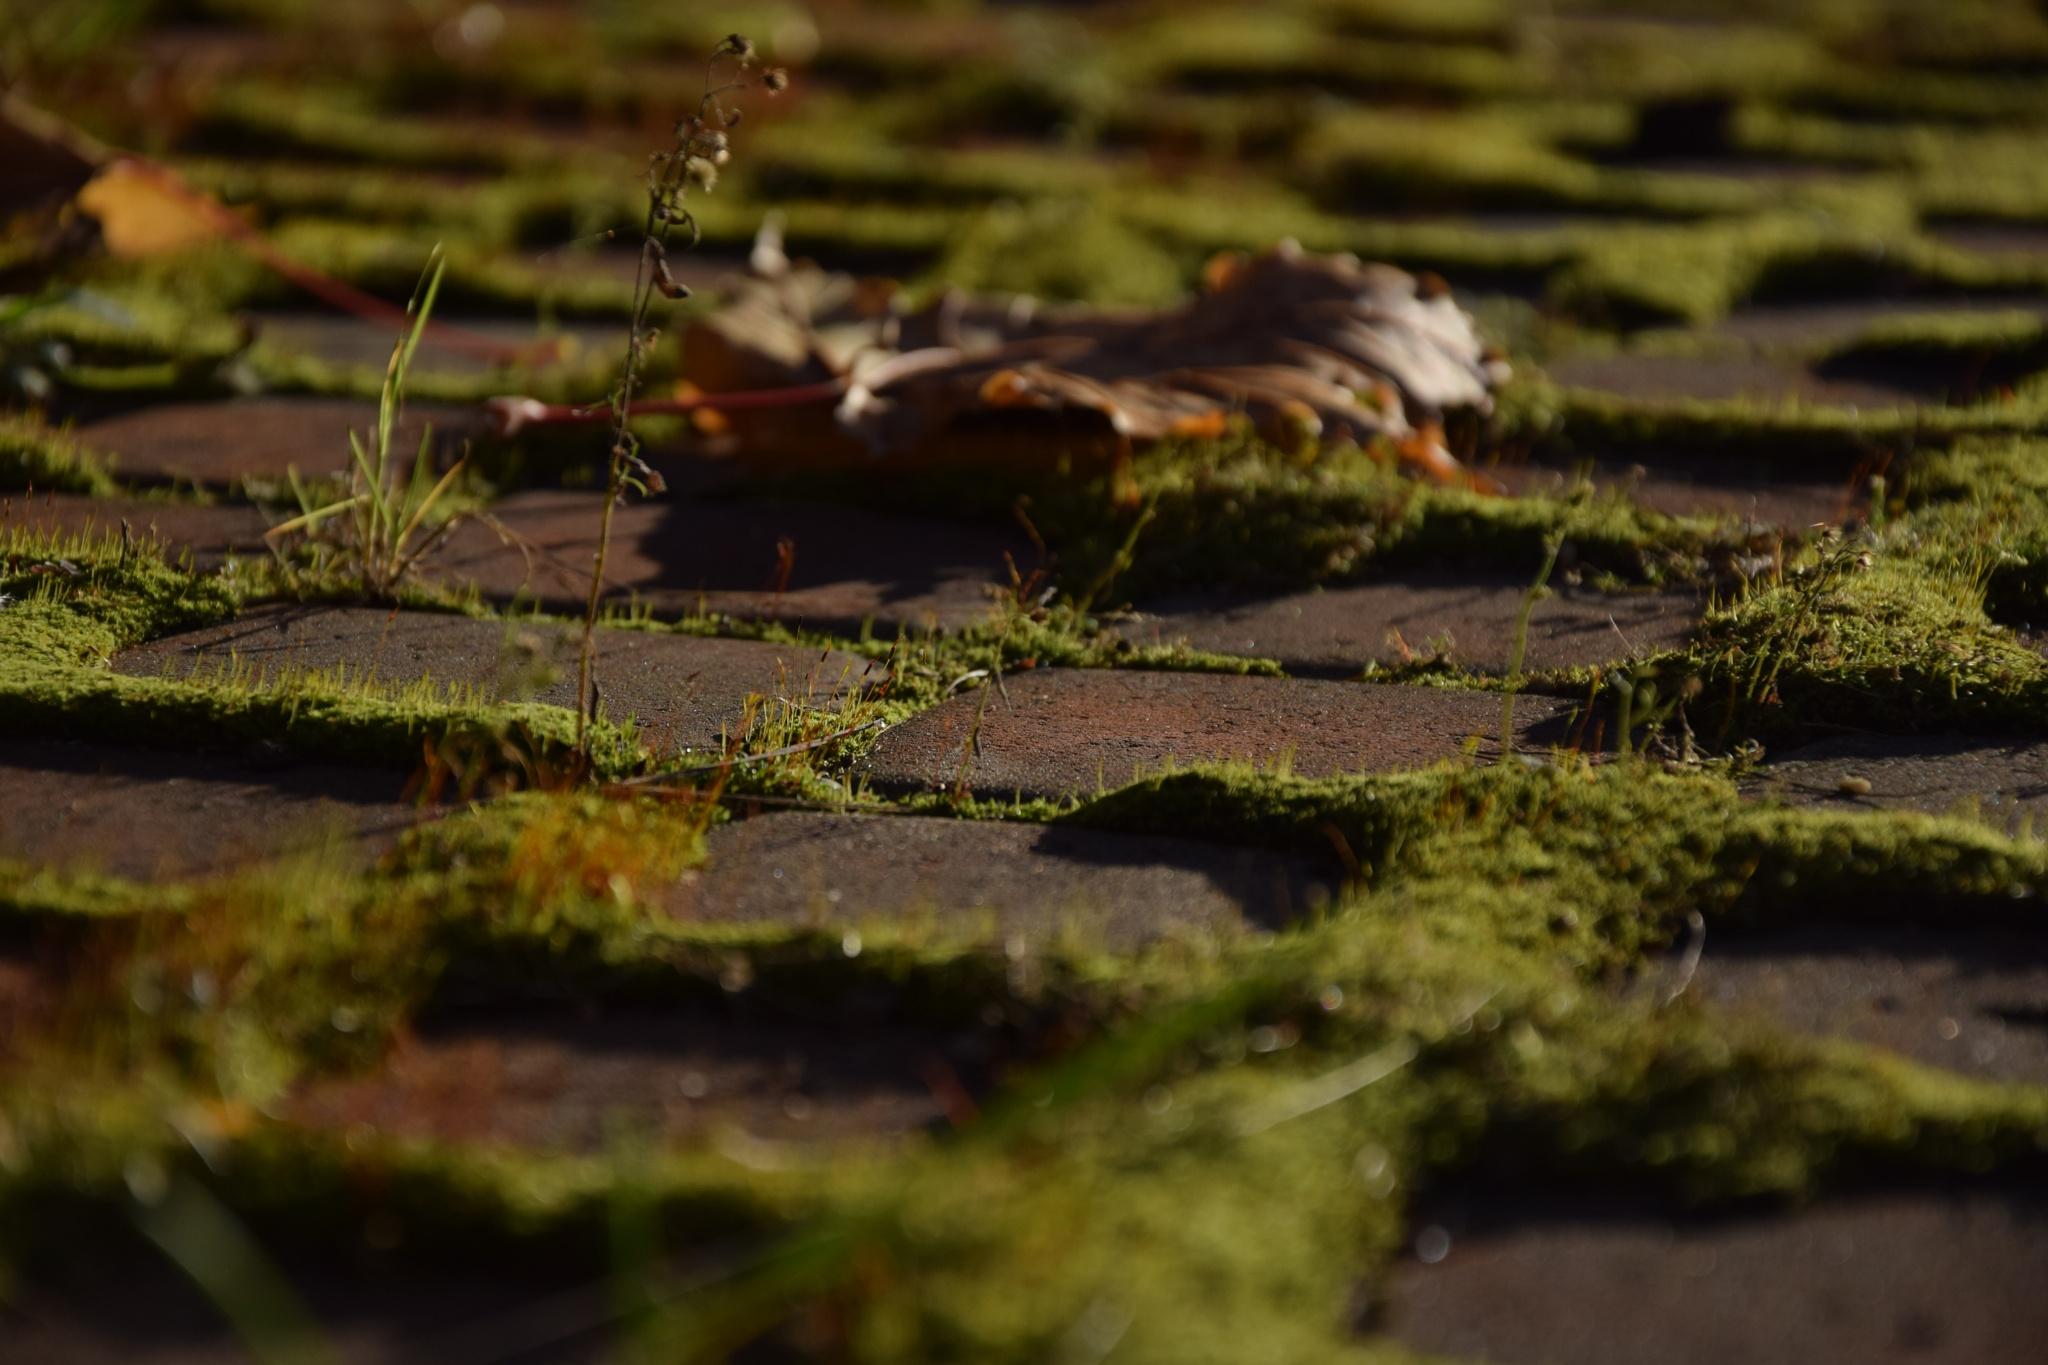 Green road by Ingrid_M